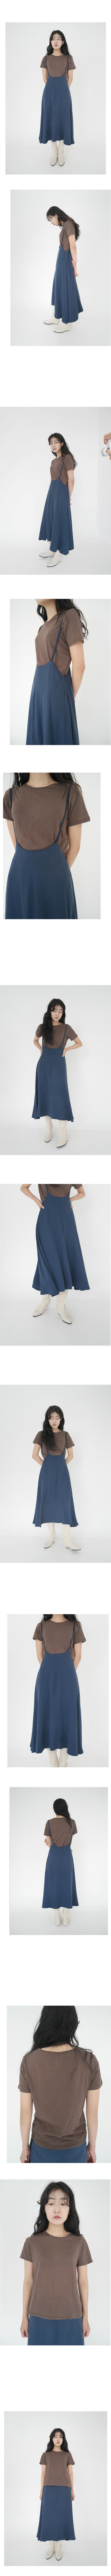 paisley linen robe